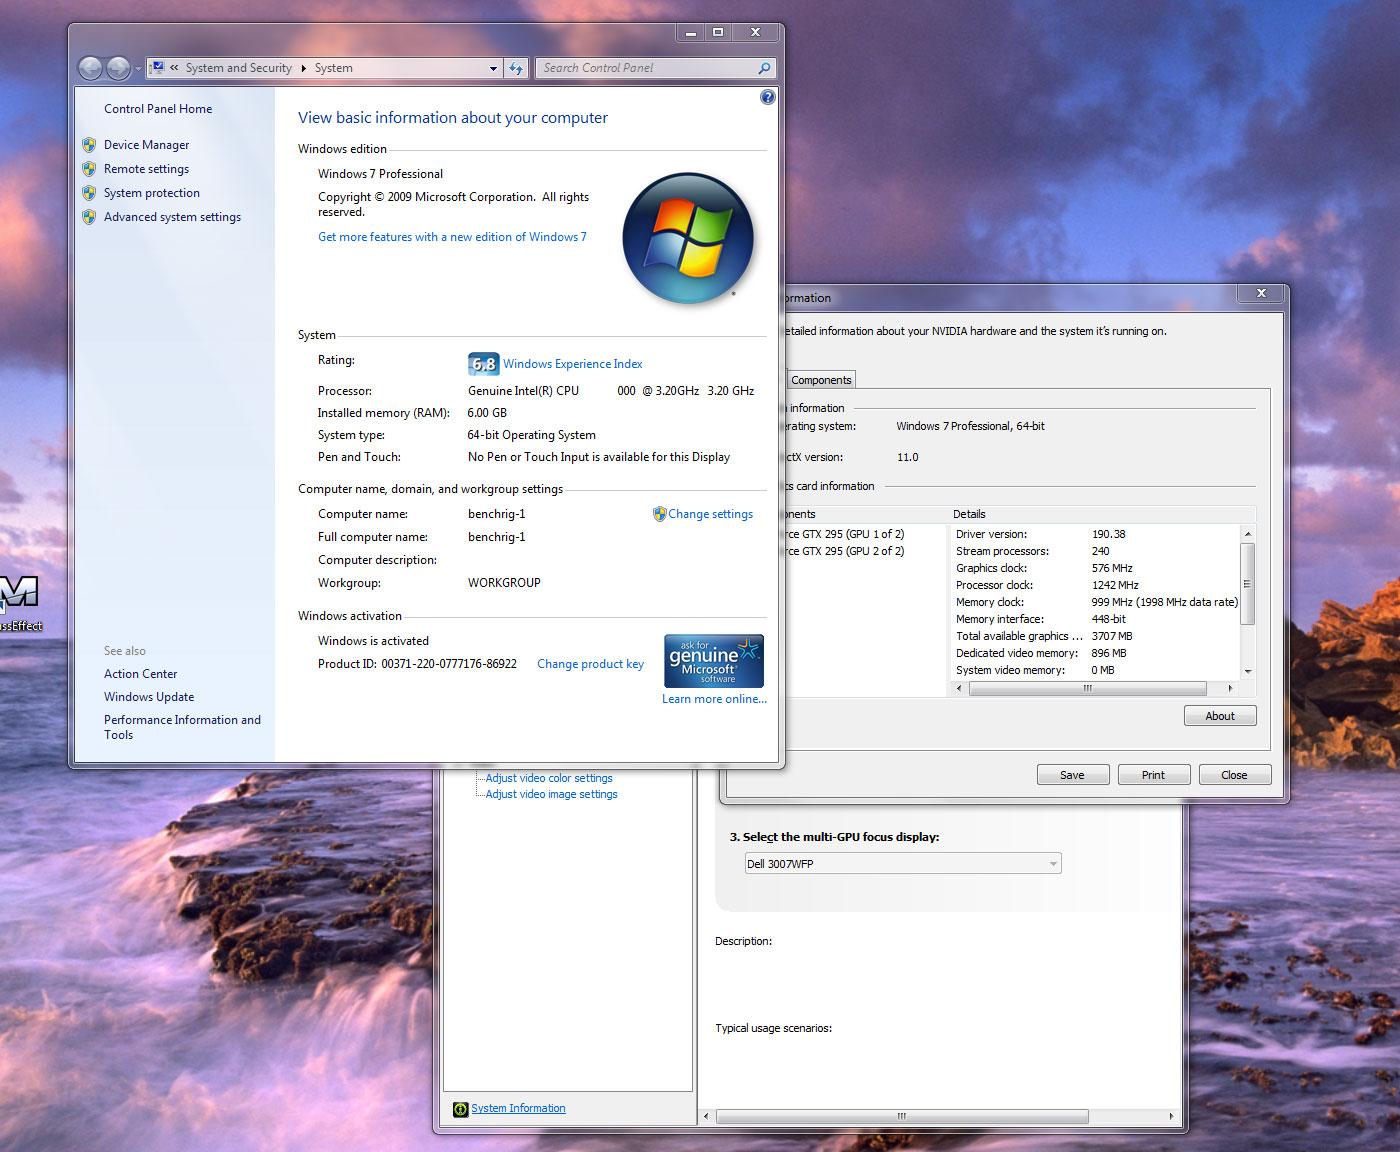 Windows 7 vs Vista VGA game performance - Test system and